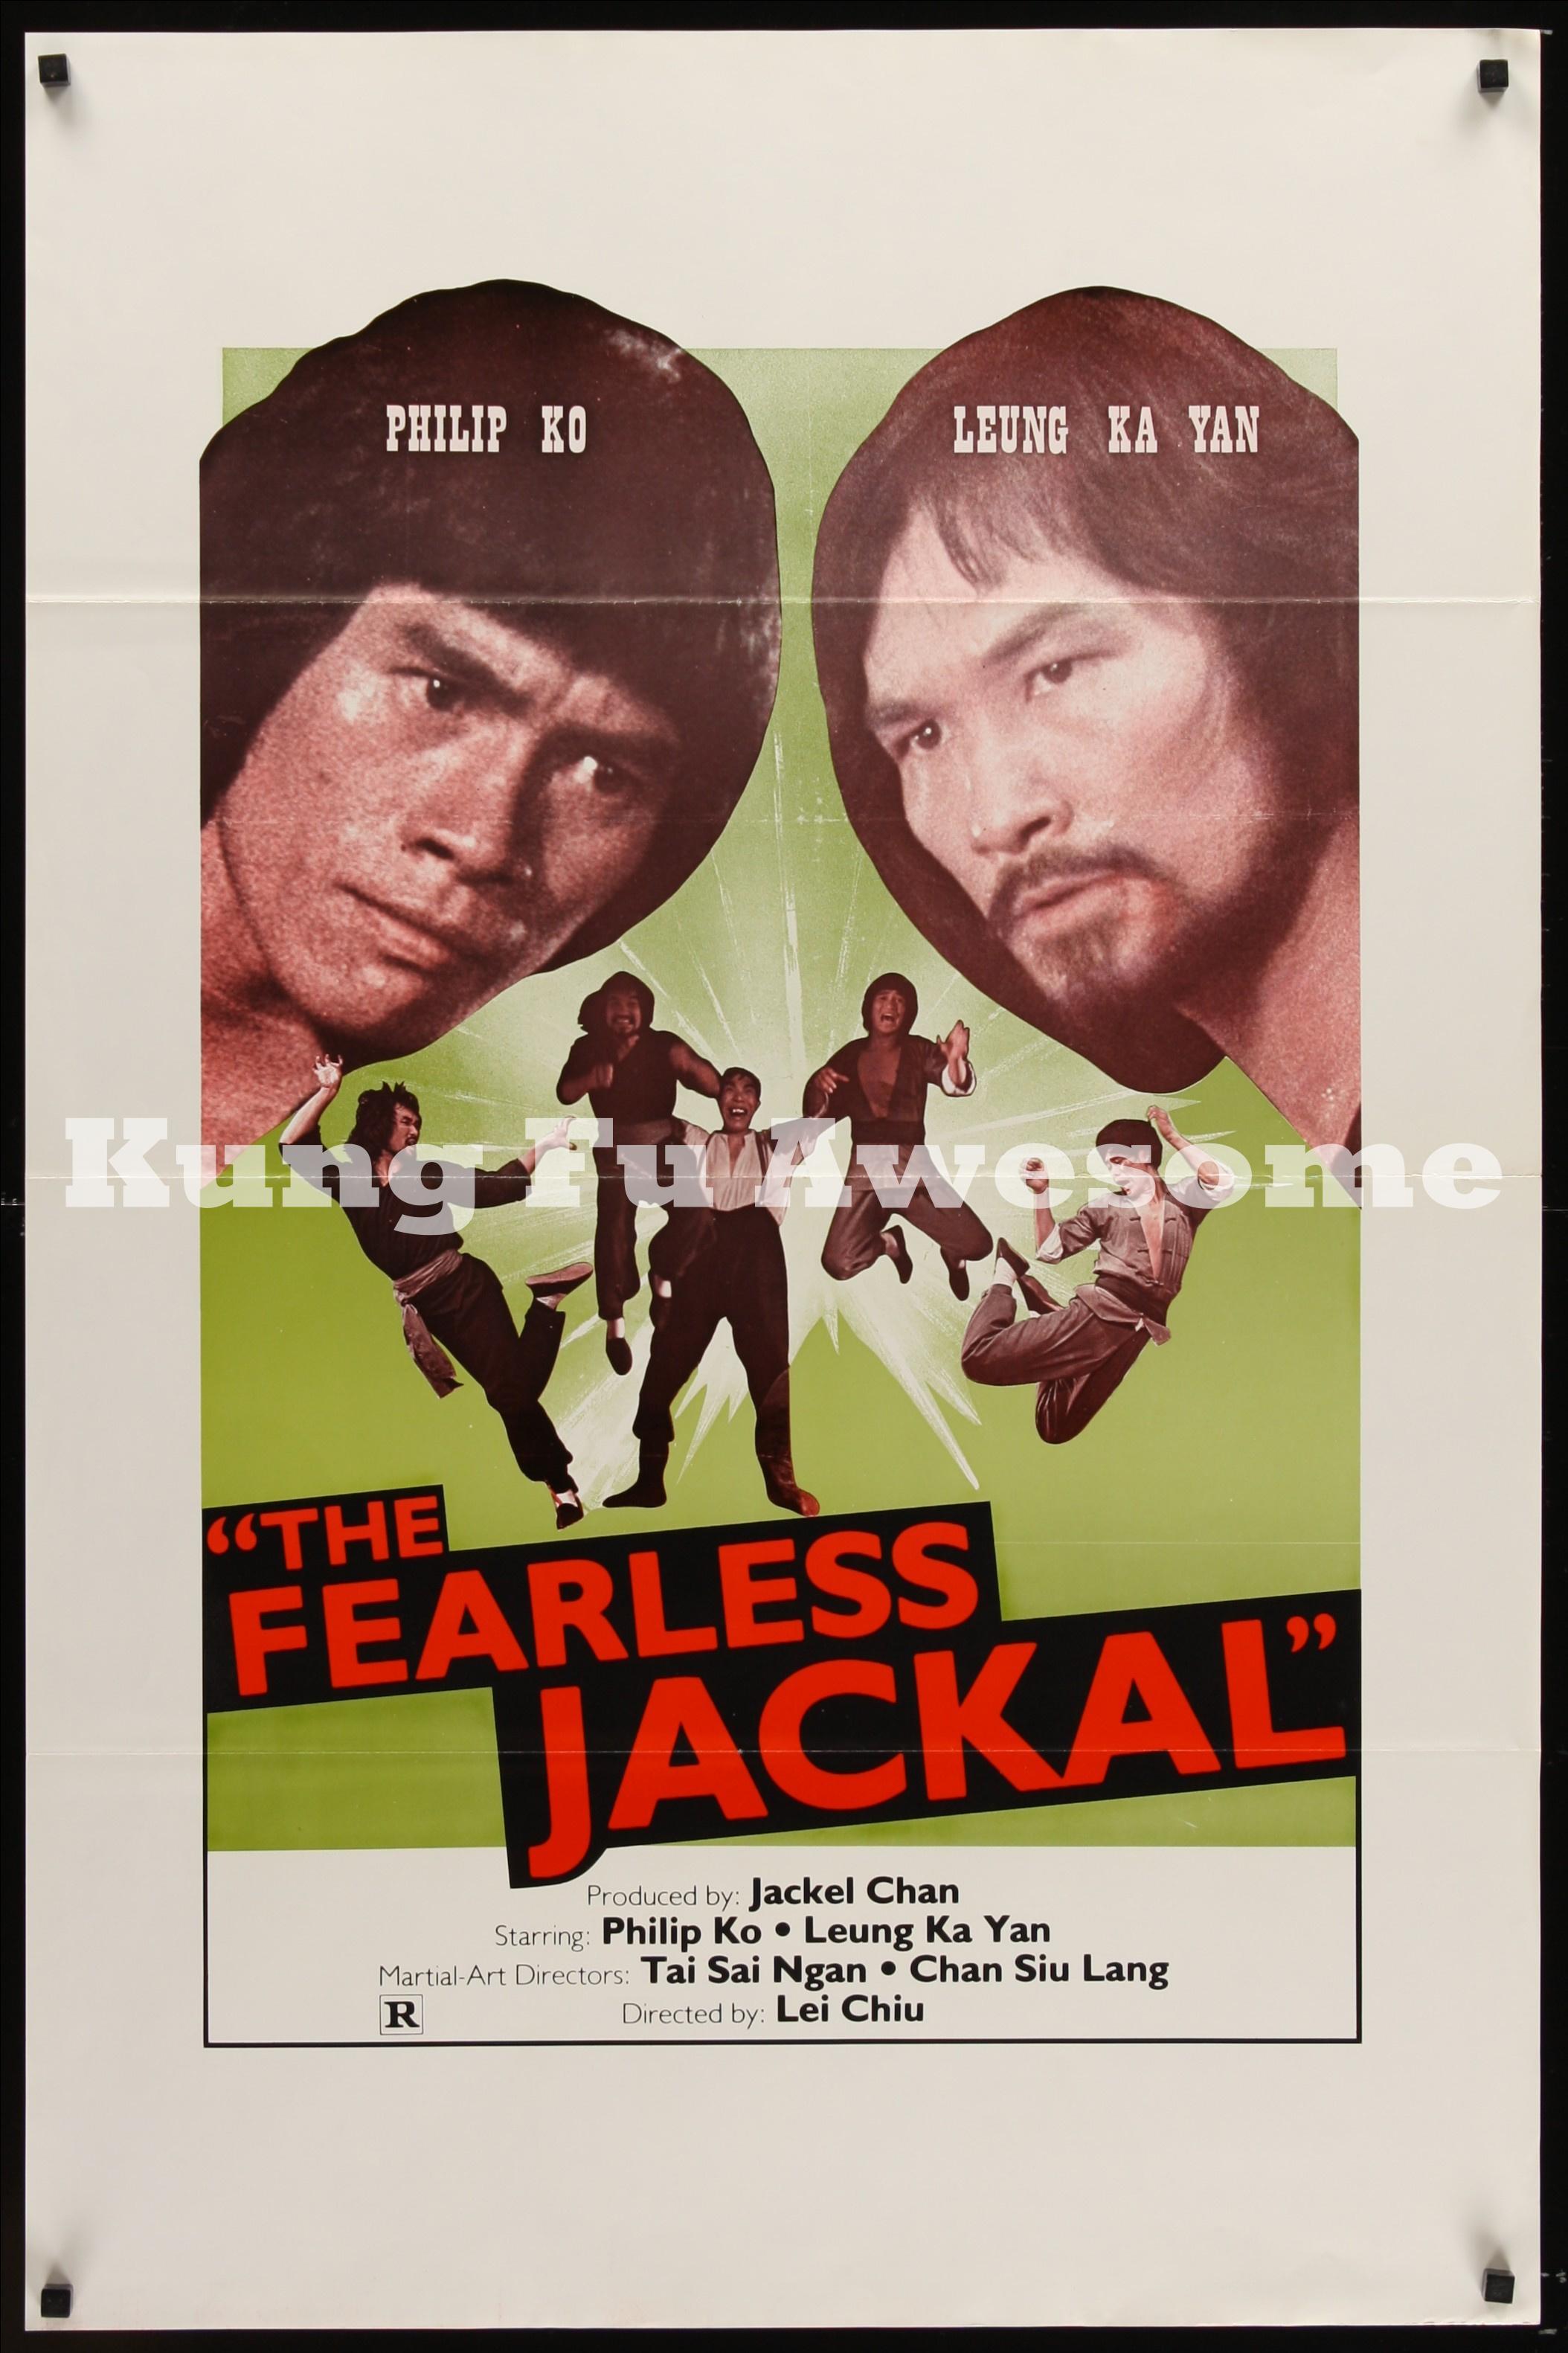 fearless_jackal_NZ03458_L.jpg